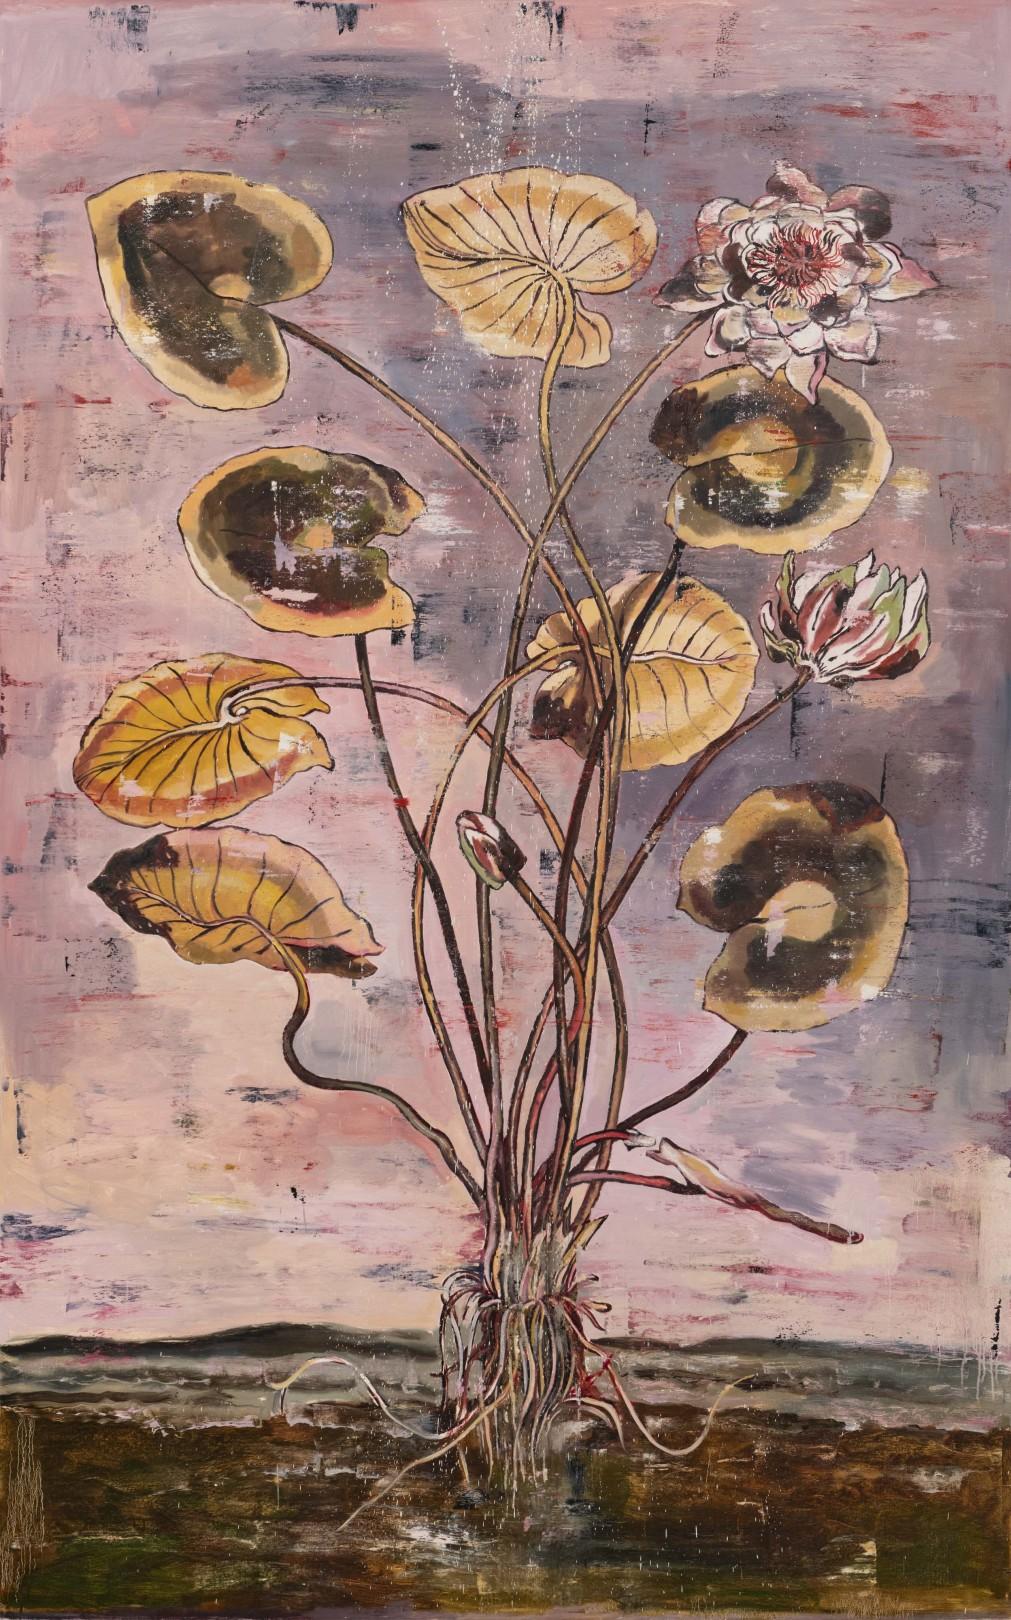 Nicky Nodjoumi Environmental Series - Nymphoa Allba, 2018 Oil on canvas 244 x 153 cm. / 96 x 60 in.